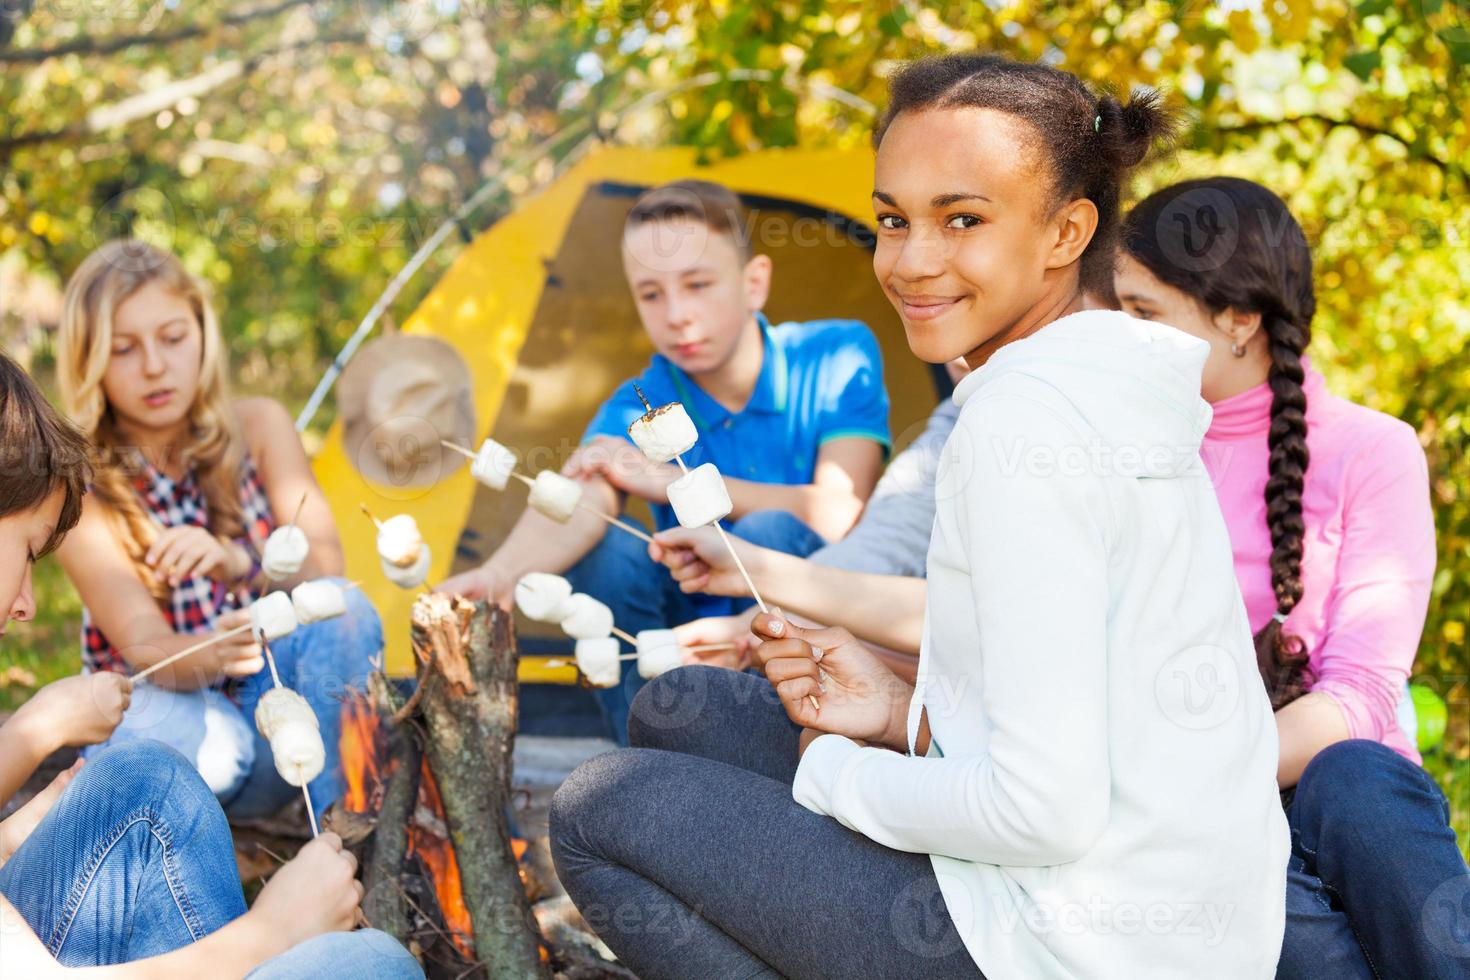 Teens with marshmallow sticks sitting near bonfire photo